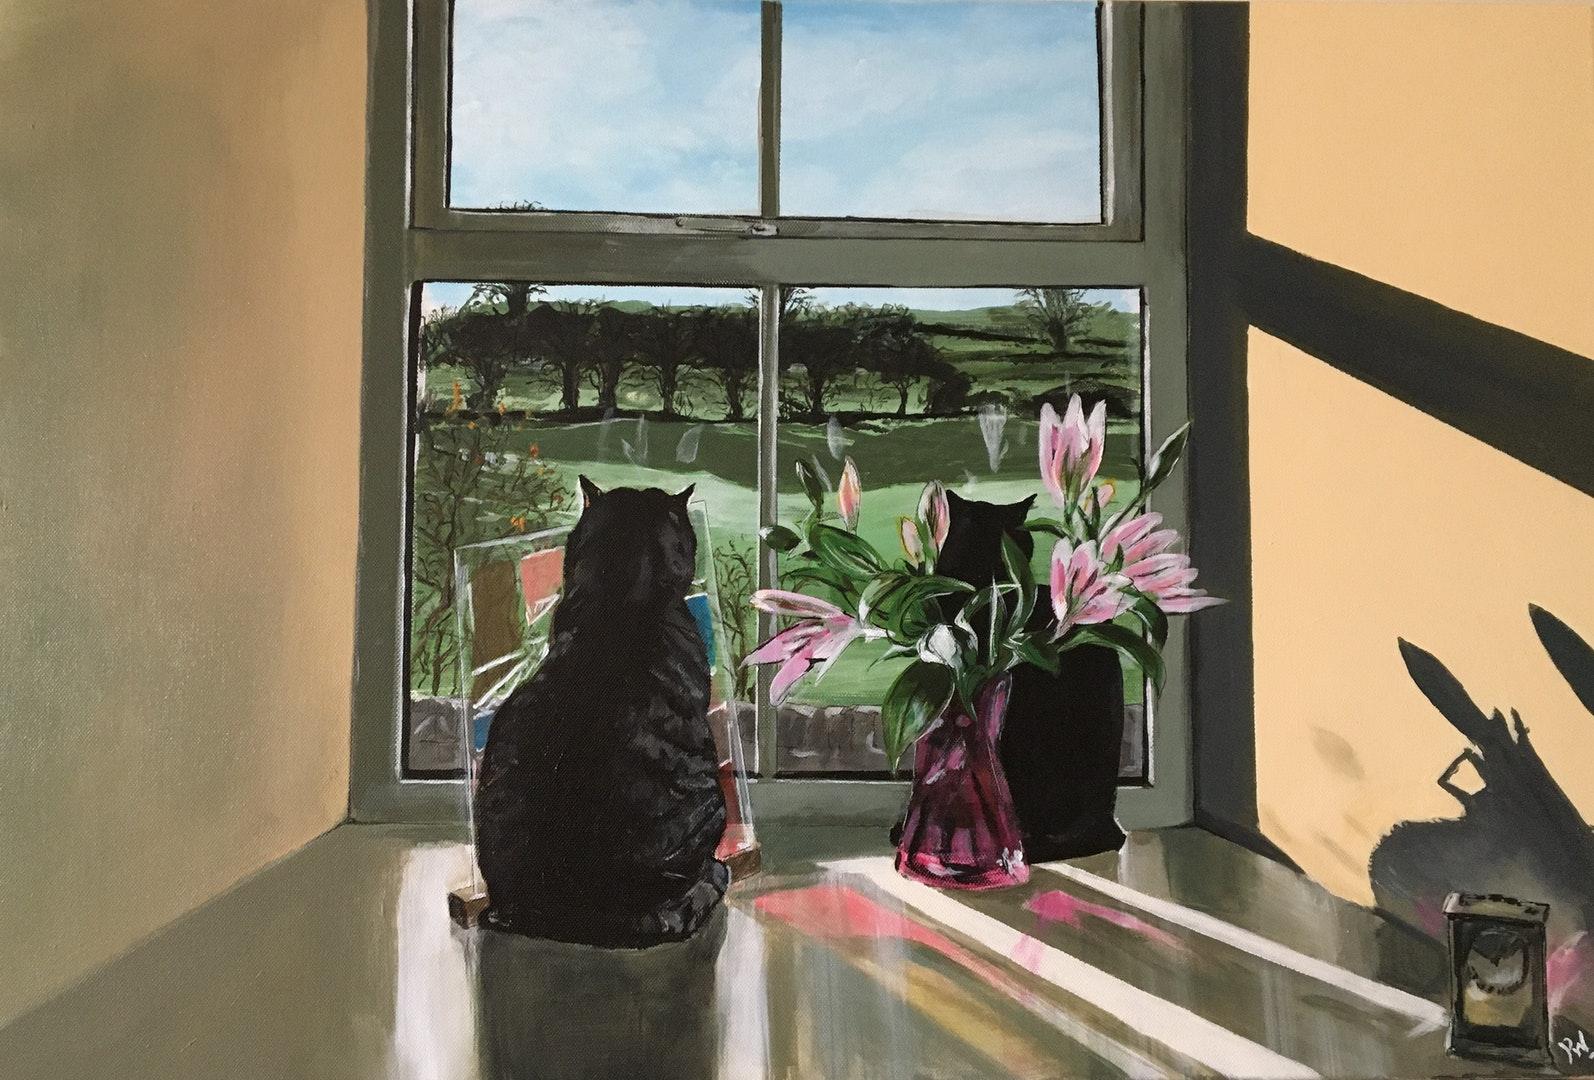 'Dougal and Em in Lockdown', Paulene Warnock, Acrylic on canvas, 50 x 76 cm